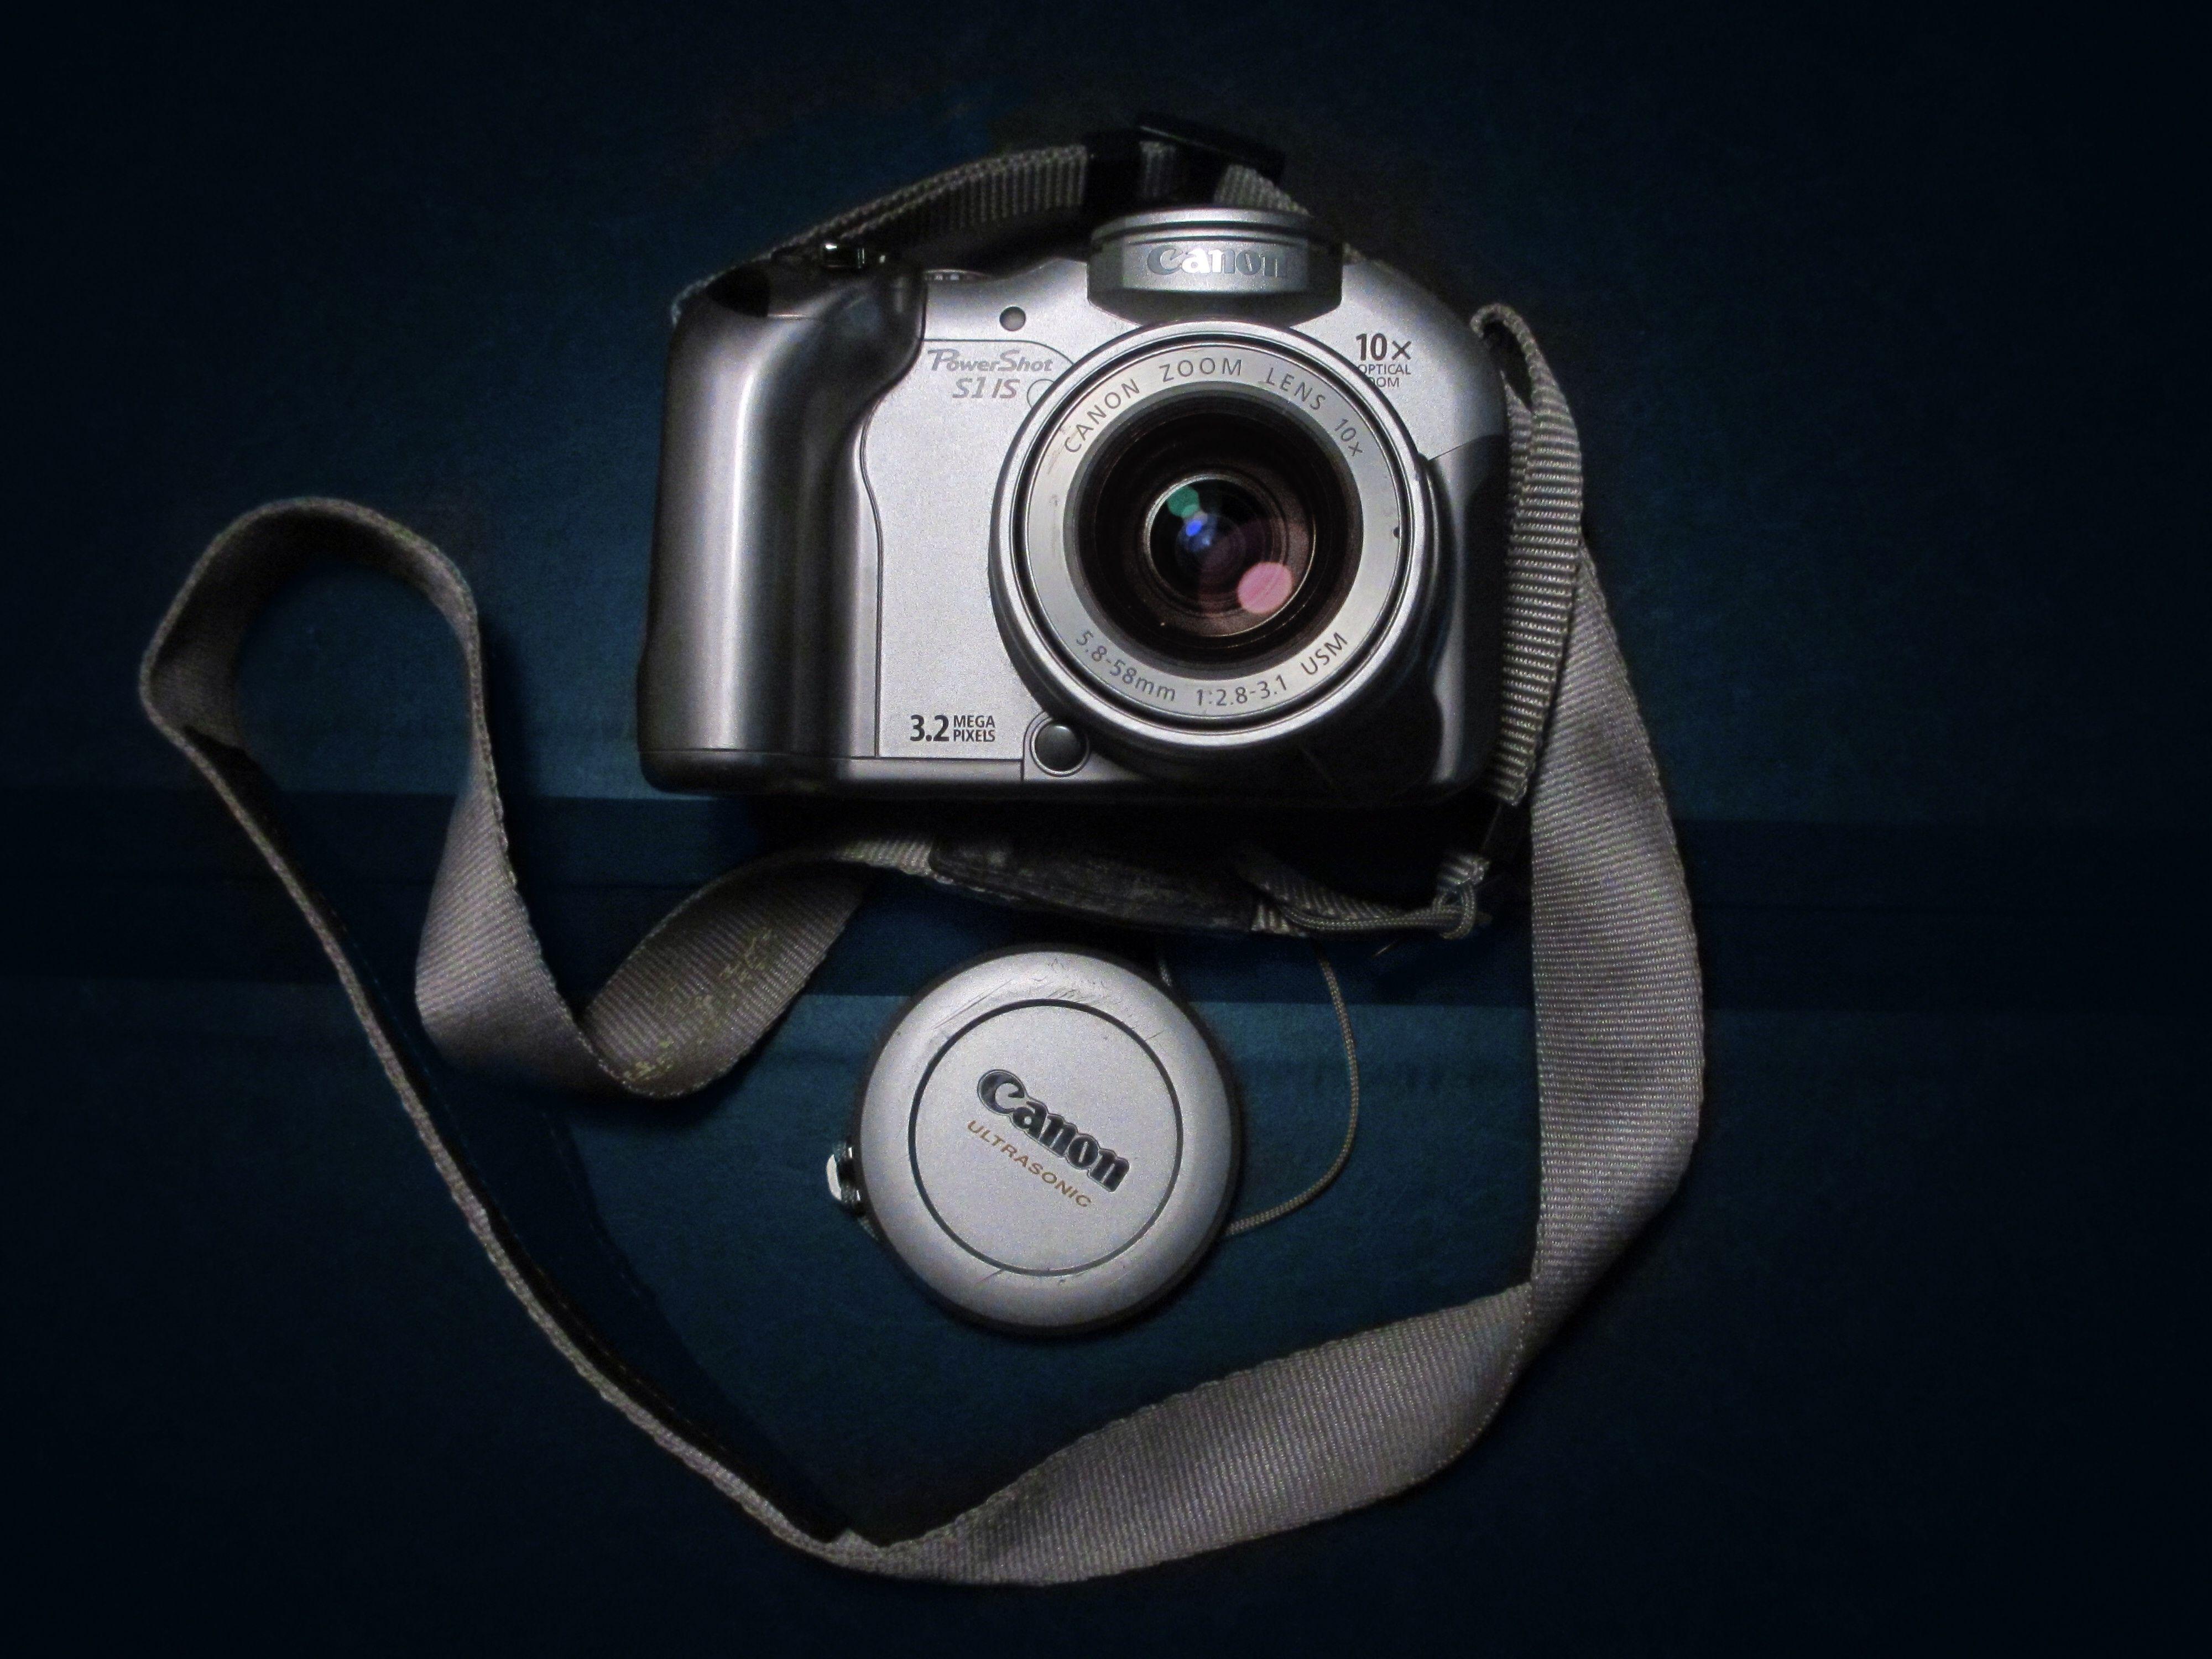 Canon Powershot S1 Is 4